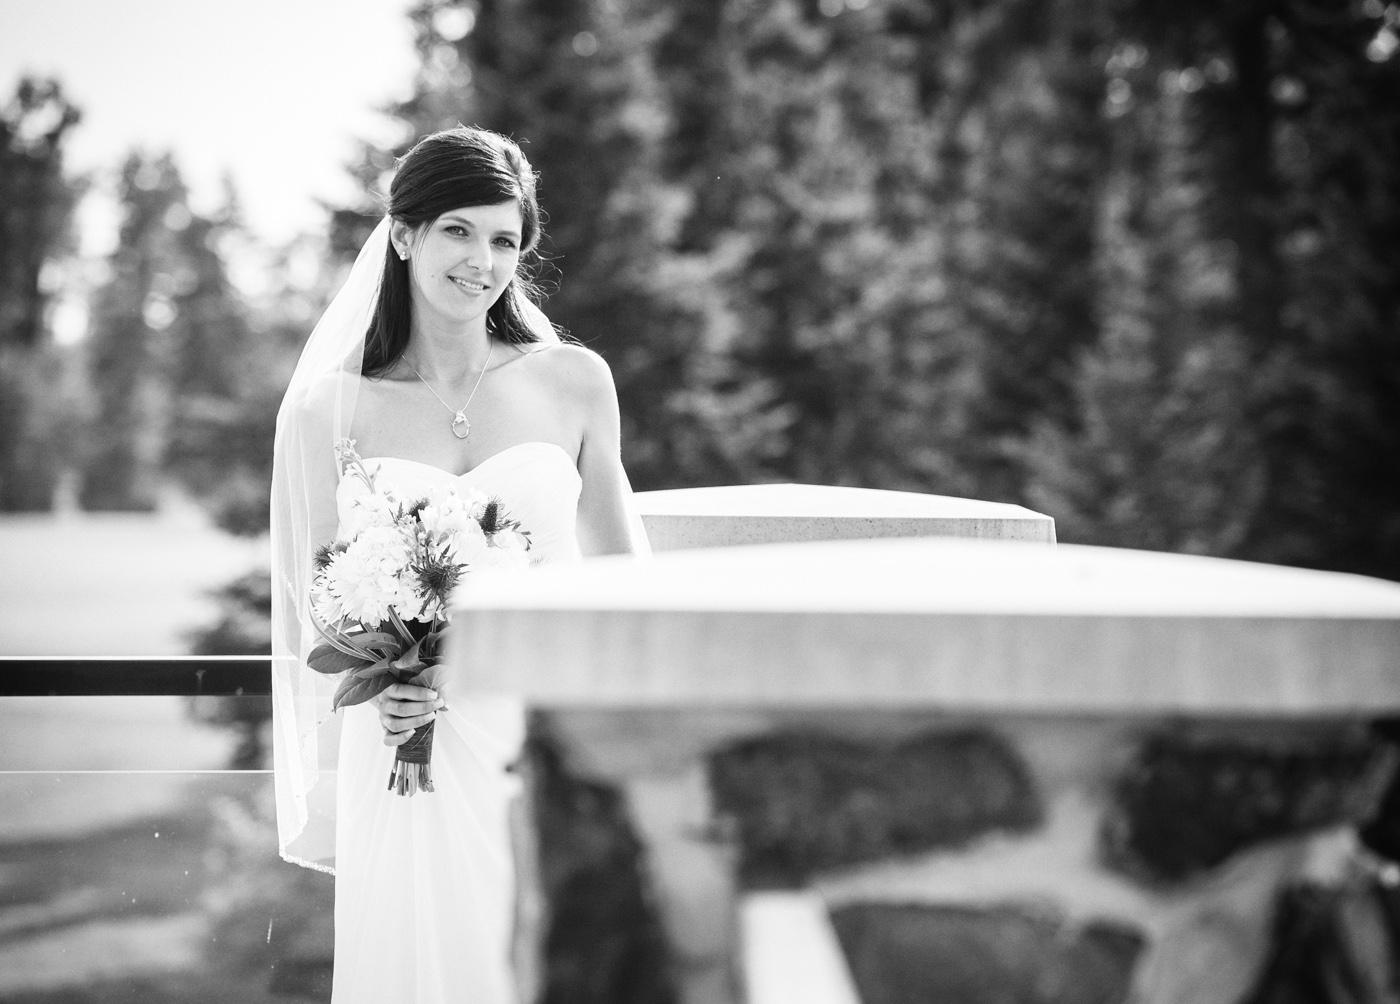 ss_weddingbest-18.jpg